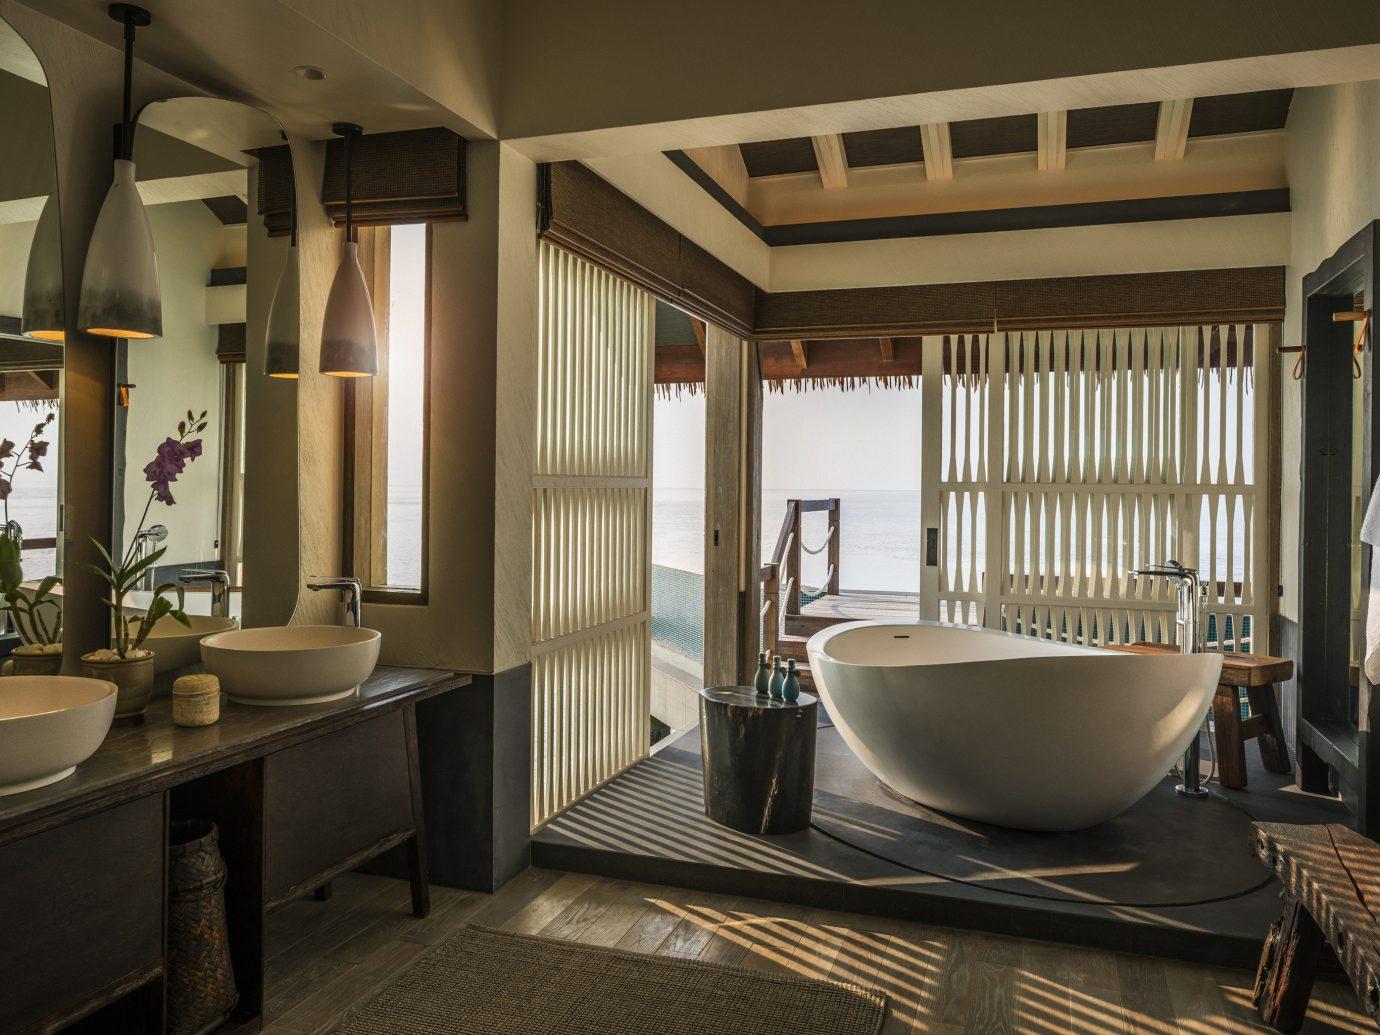 All-Inclusive Resorts Hotels indoor wall window bathroom floor room interior design ceiling sink Suite estate interior designer furniture